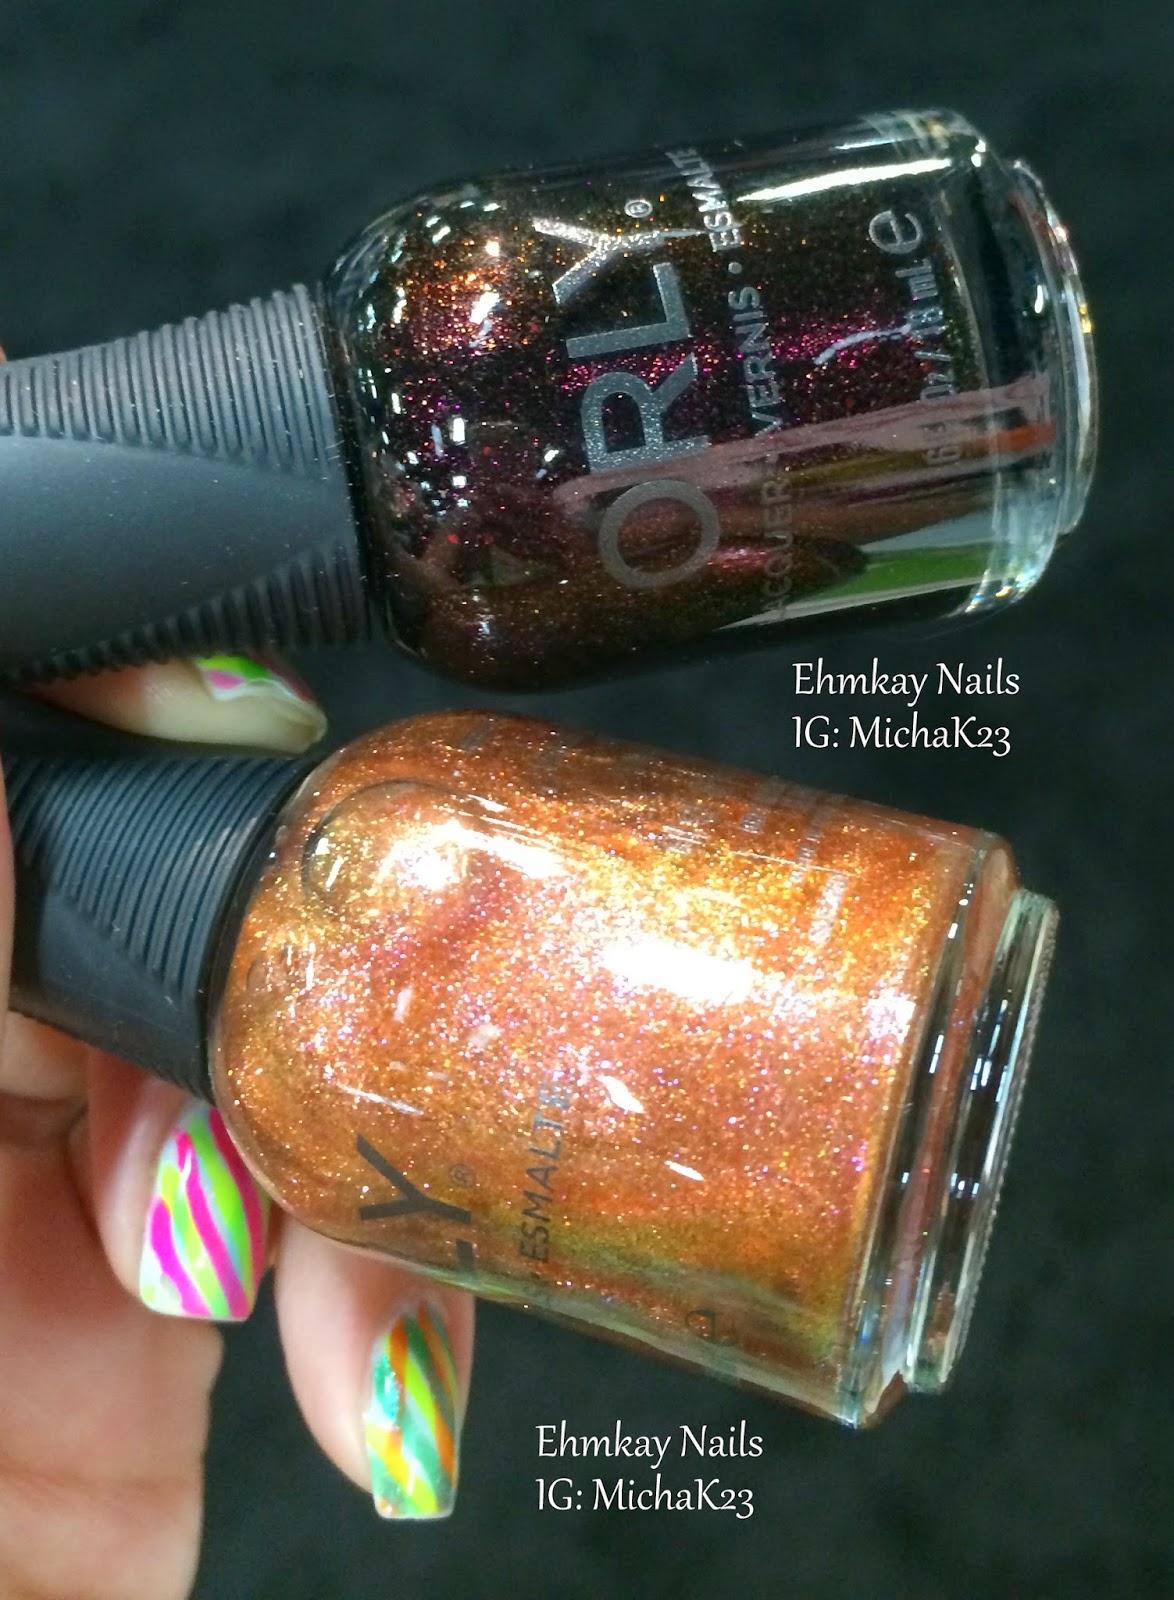 Orly Preview In The Mix Fall Winter 2015 Nail Polish: Ehmkay Nails: Cosmoprof NALV 2014 Previews